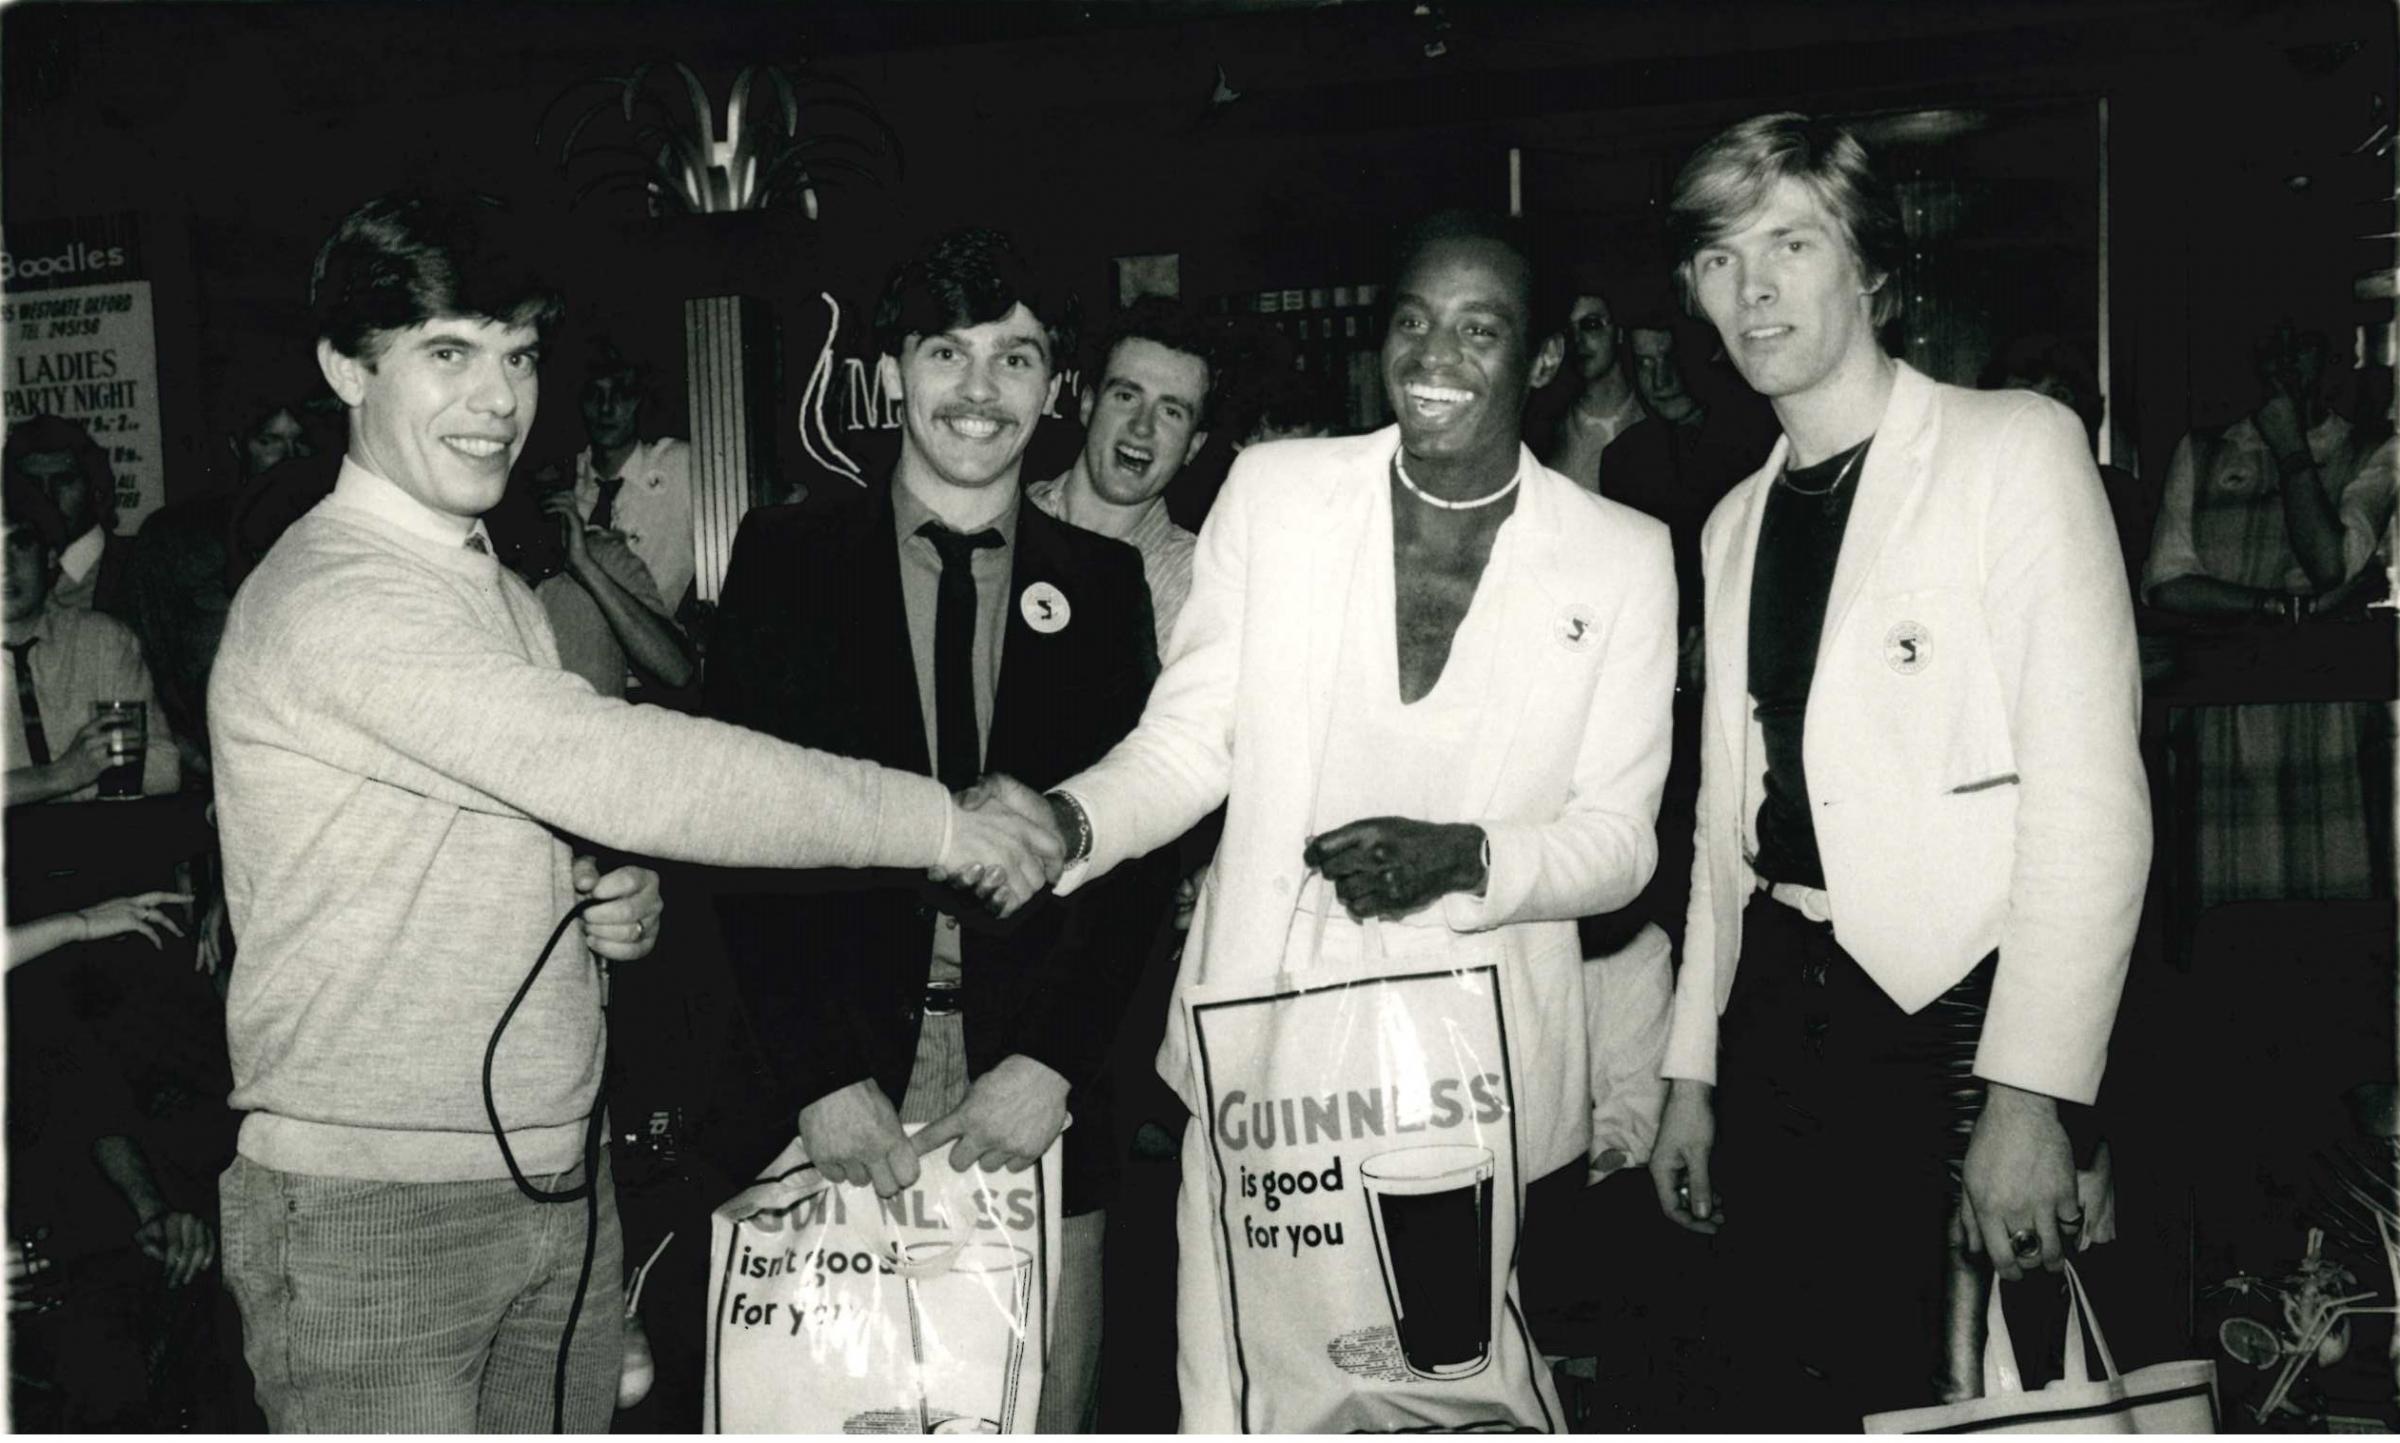 Remember When: Disco stars did battle at Westgate nightclub